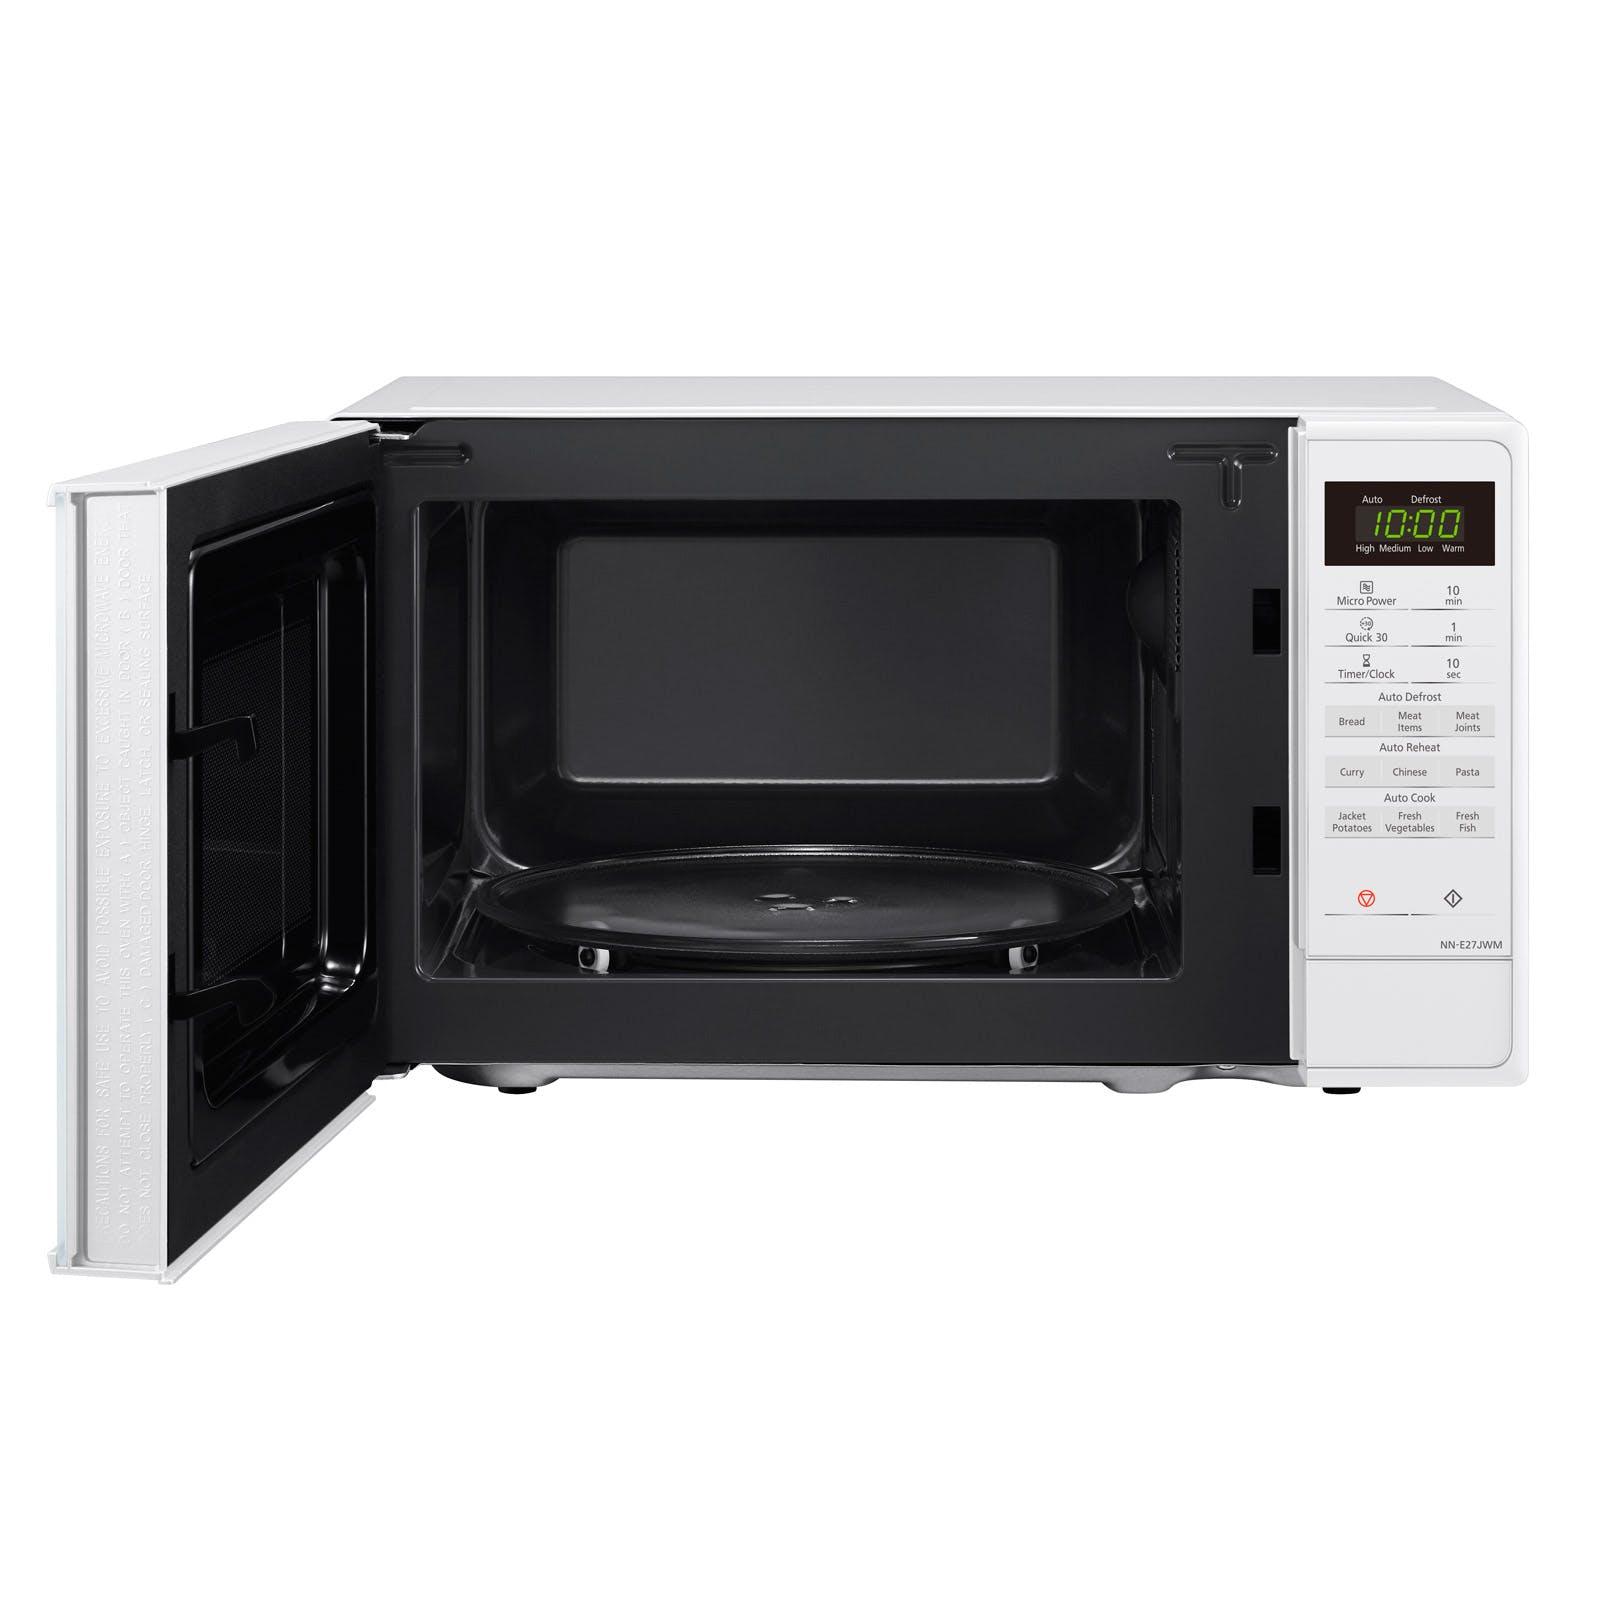 Panasonic NN-E27JWMBPQ Compact Microwave Oven in White, 20 Litre, 800W